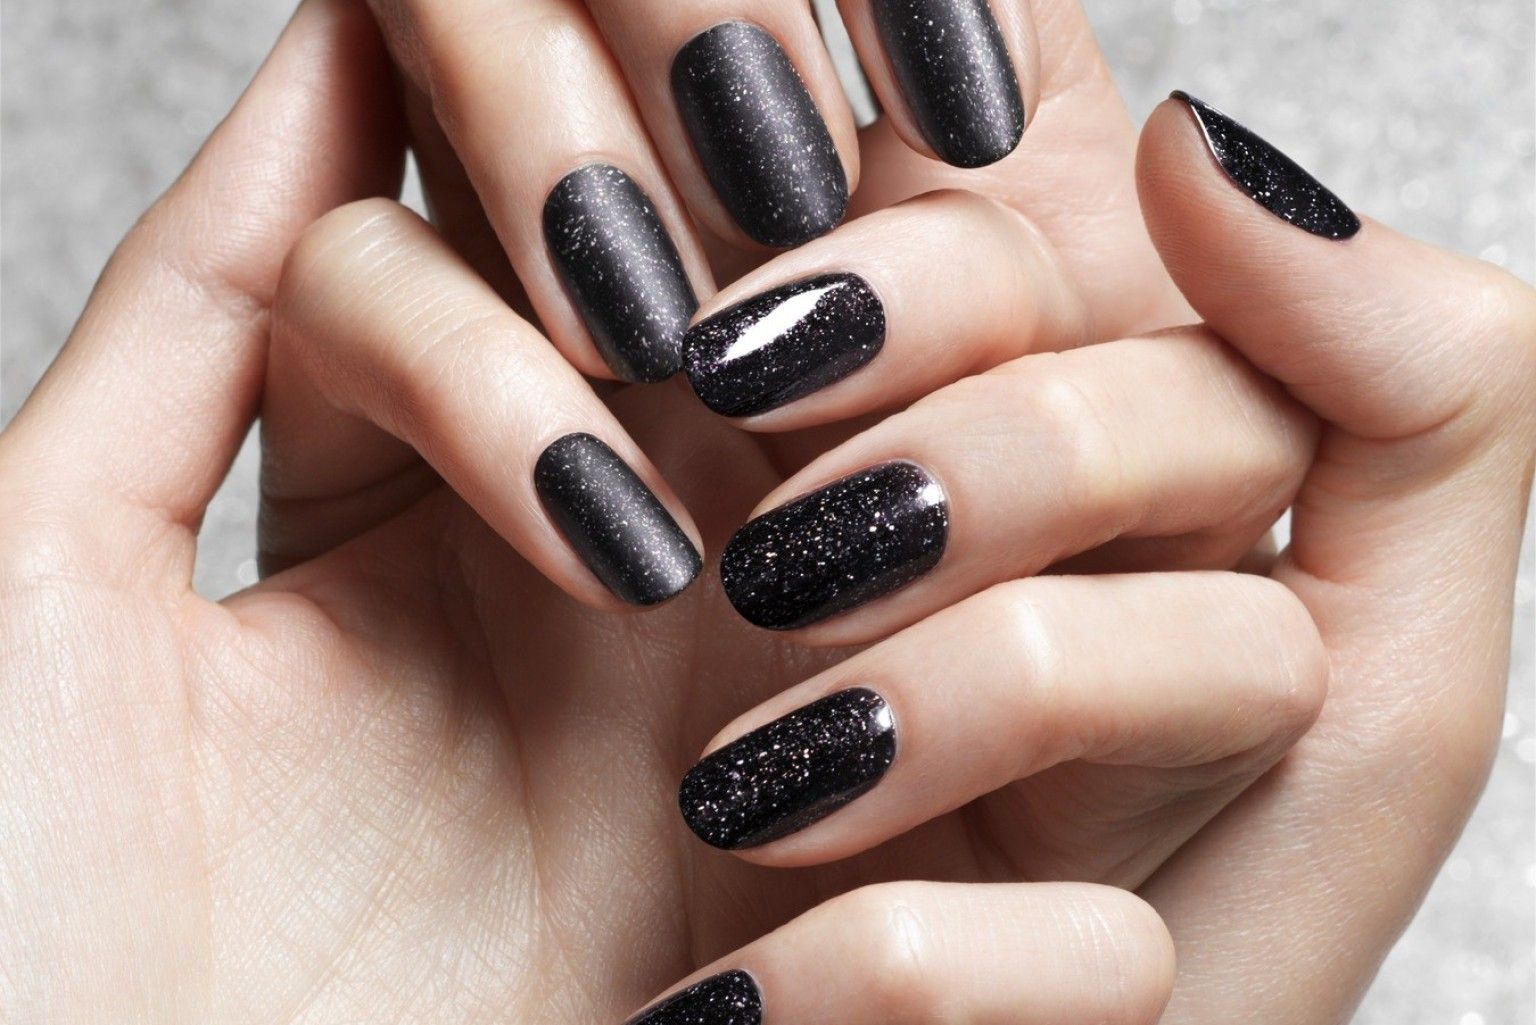 Obsidian Nail Polish Is The New Black (PHOTOS) | Nail polish colors ...